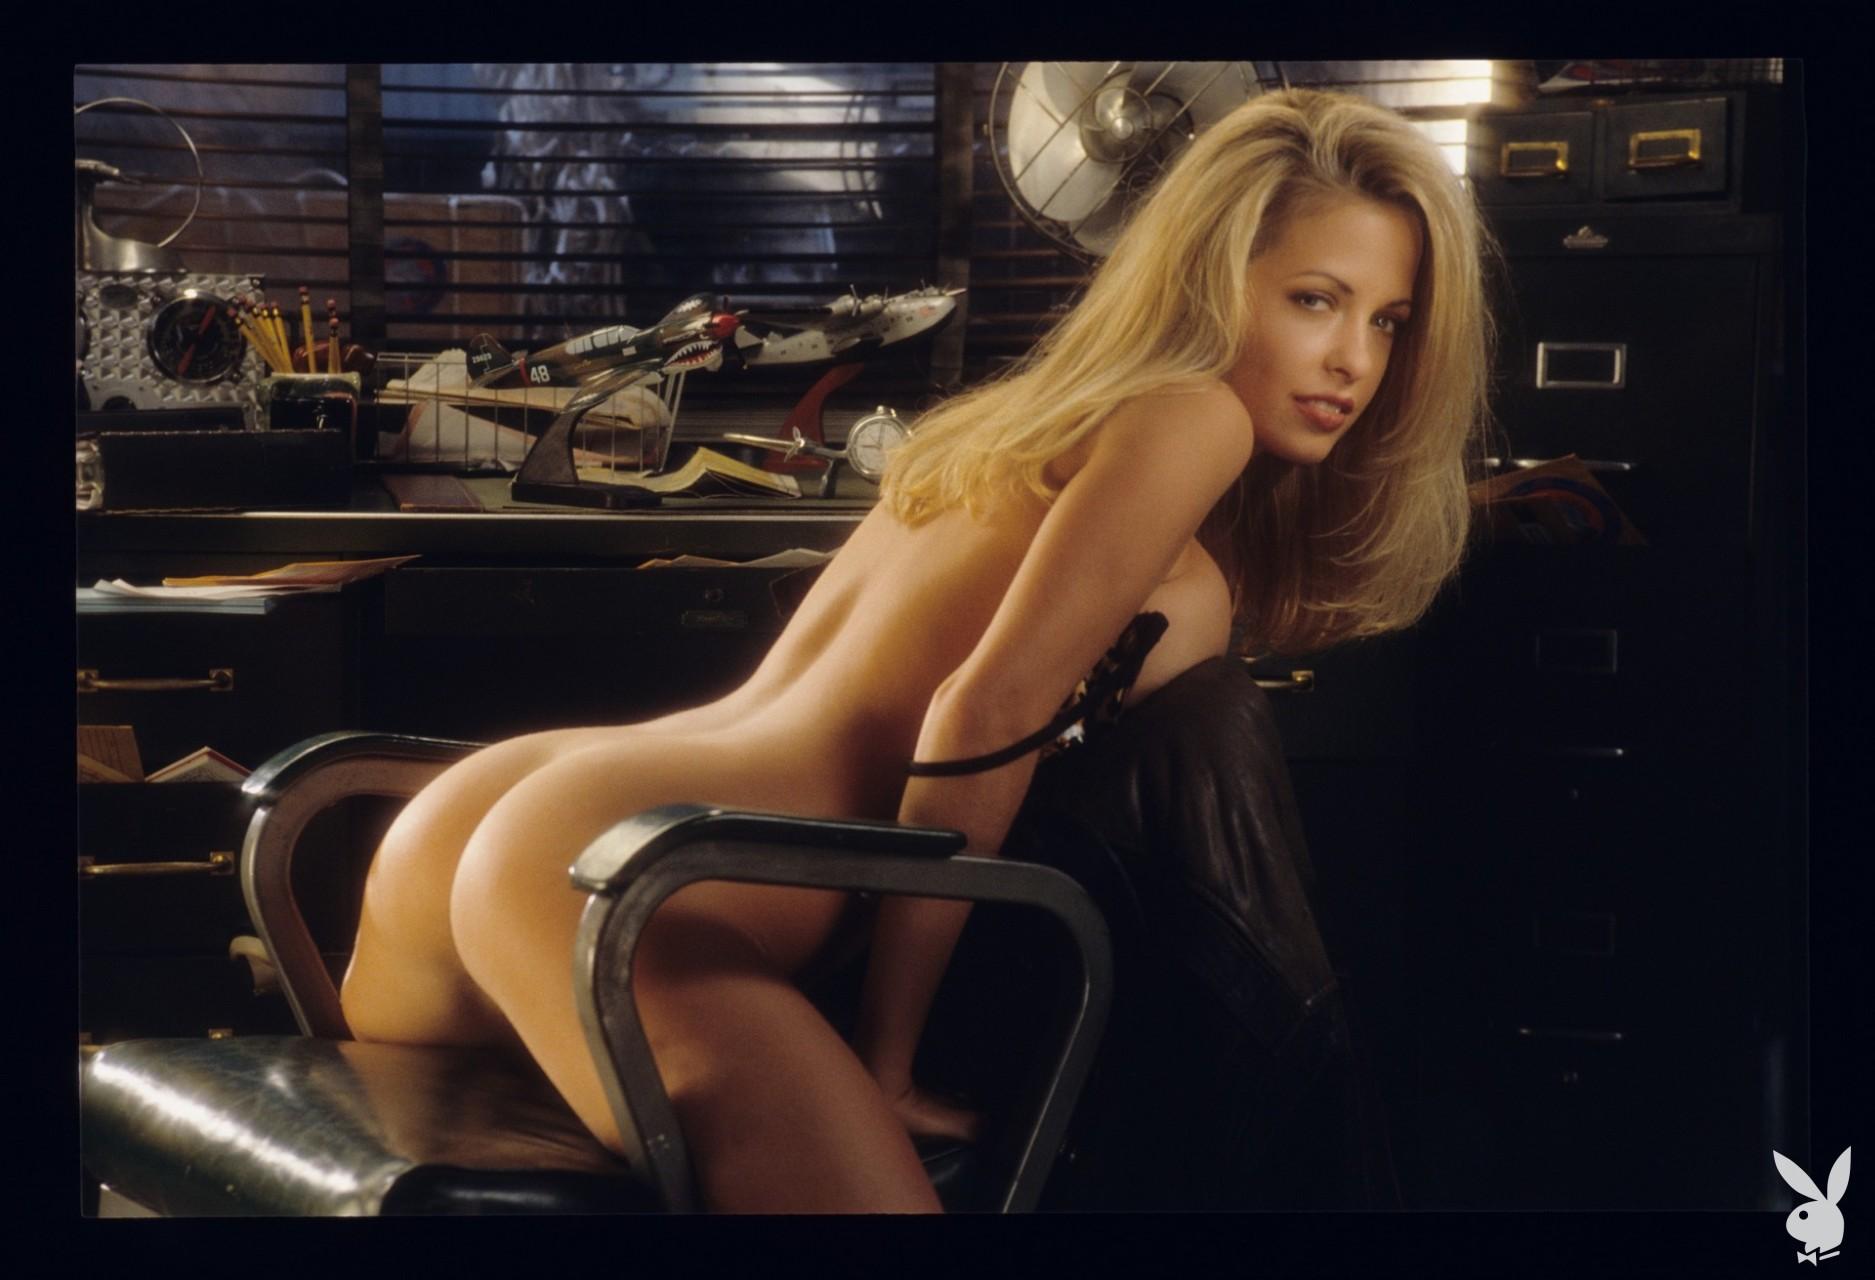 Playmate June 1995 Rhonda Adams Playboy Plus (9)